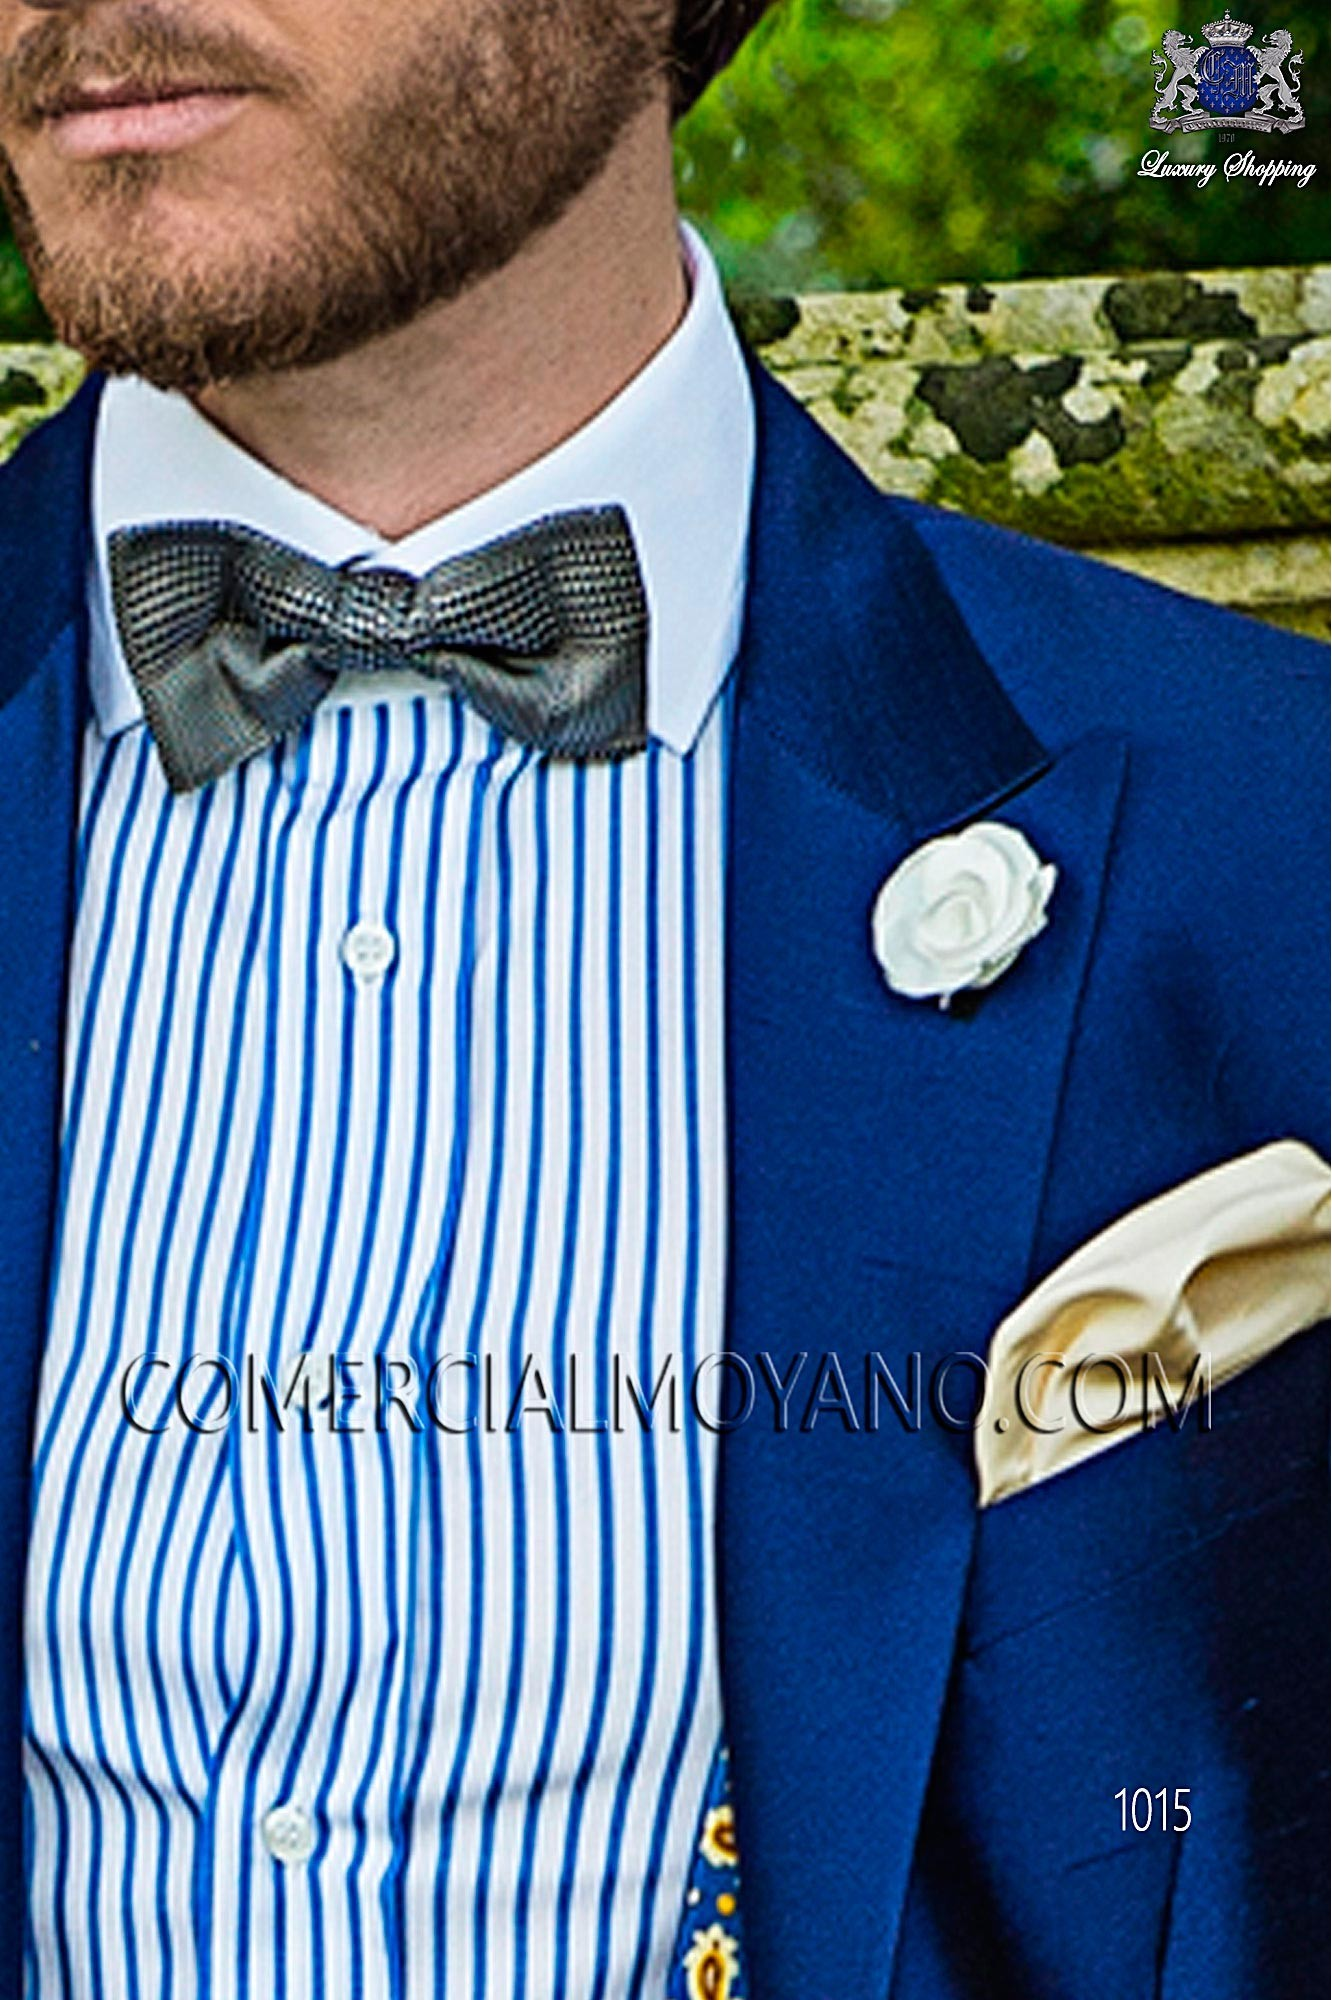 Blue jacquard silk bow tie, Ottavio Nuccio Gala.